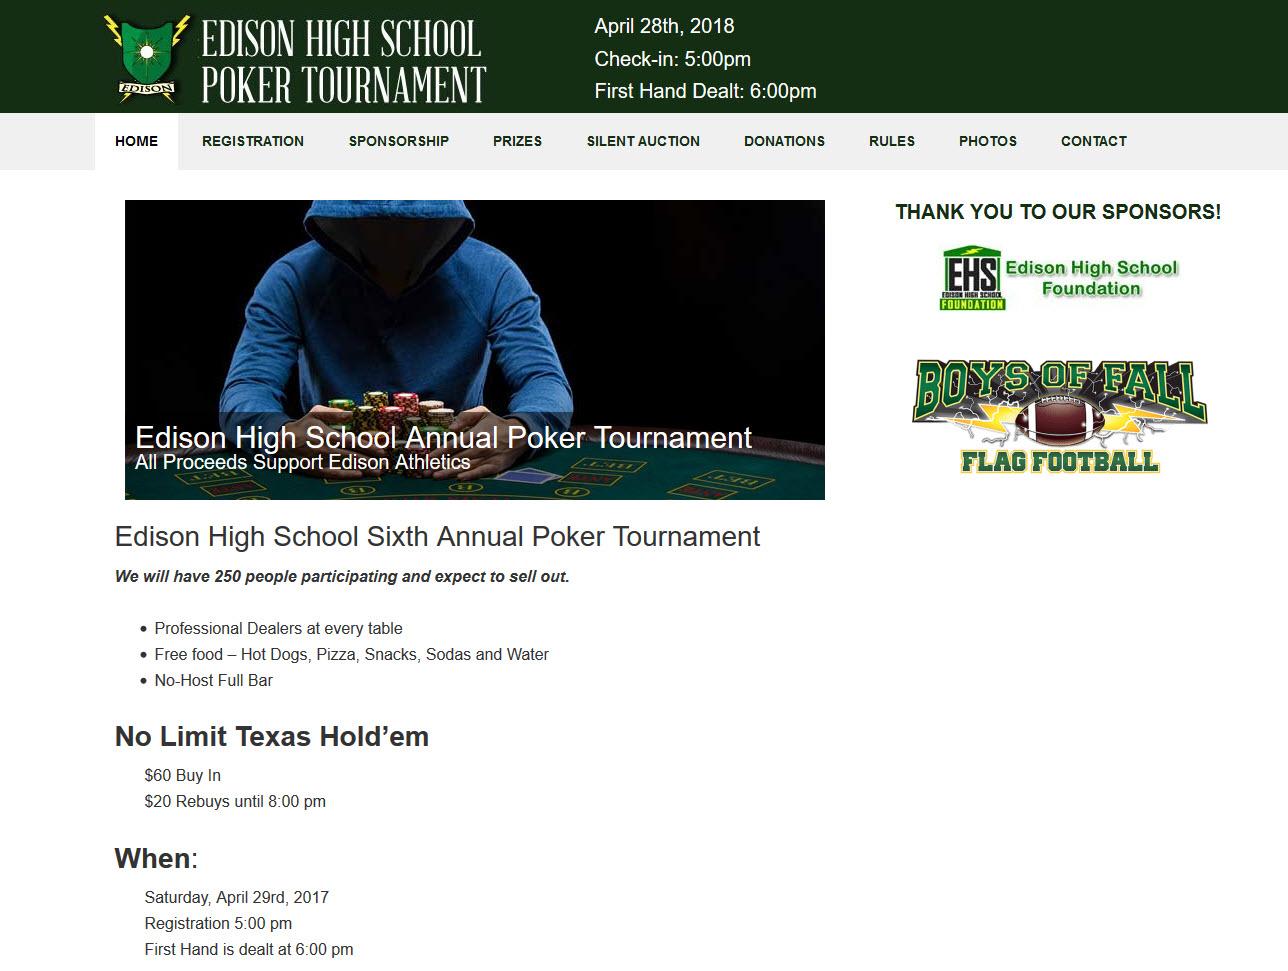 Official Edison High School Poker Tournament